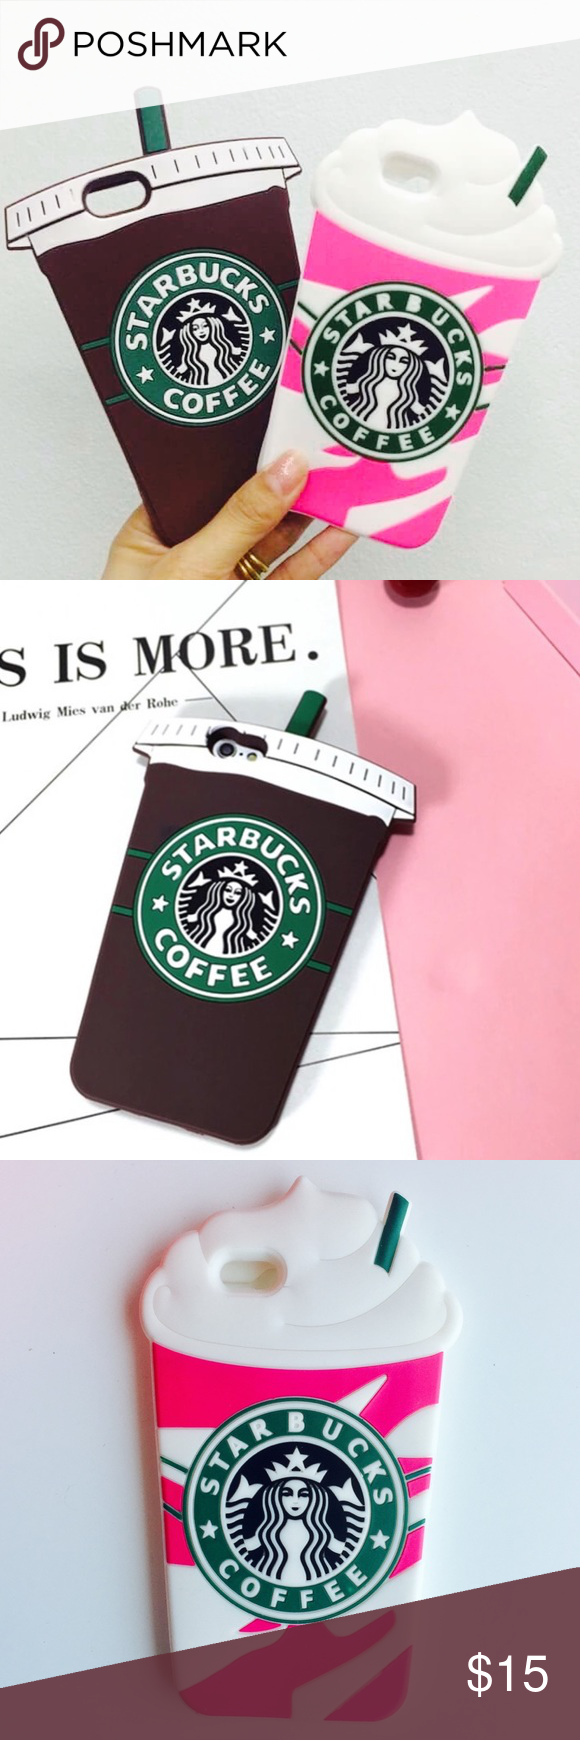 Starbucks Coffee Cup Iphone case Boutique Starbucks